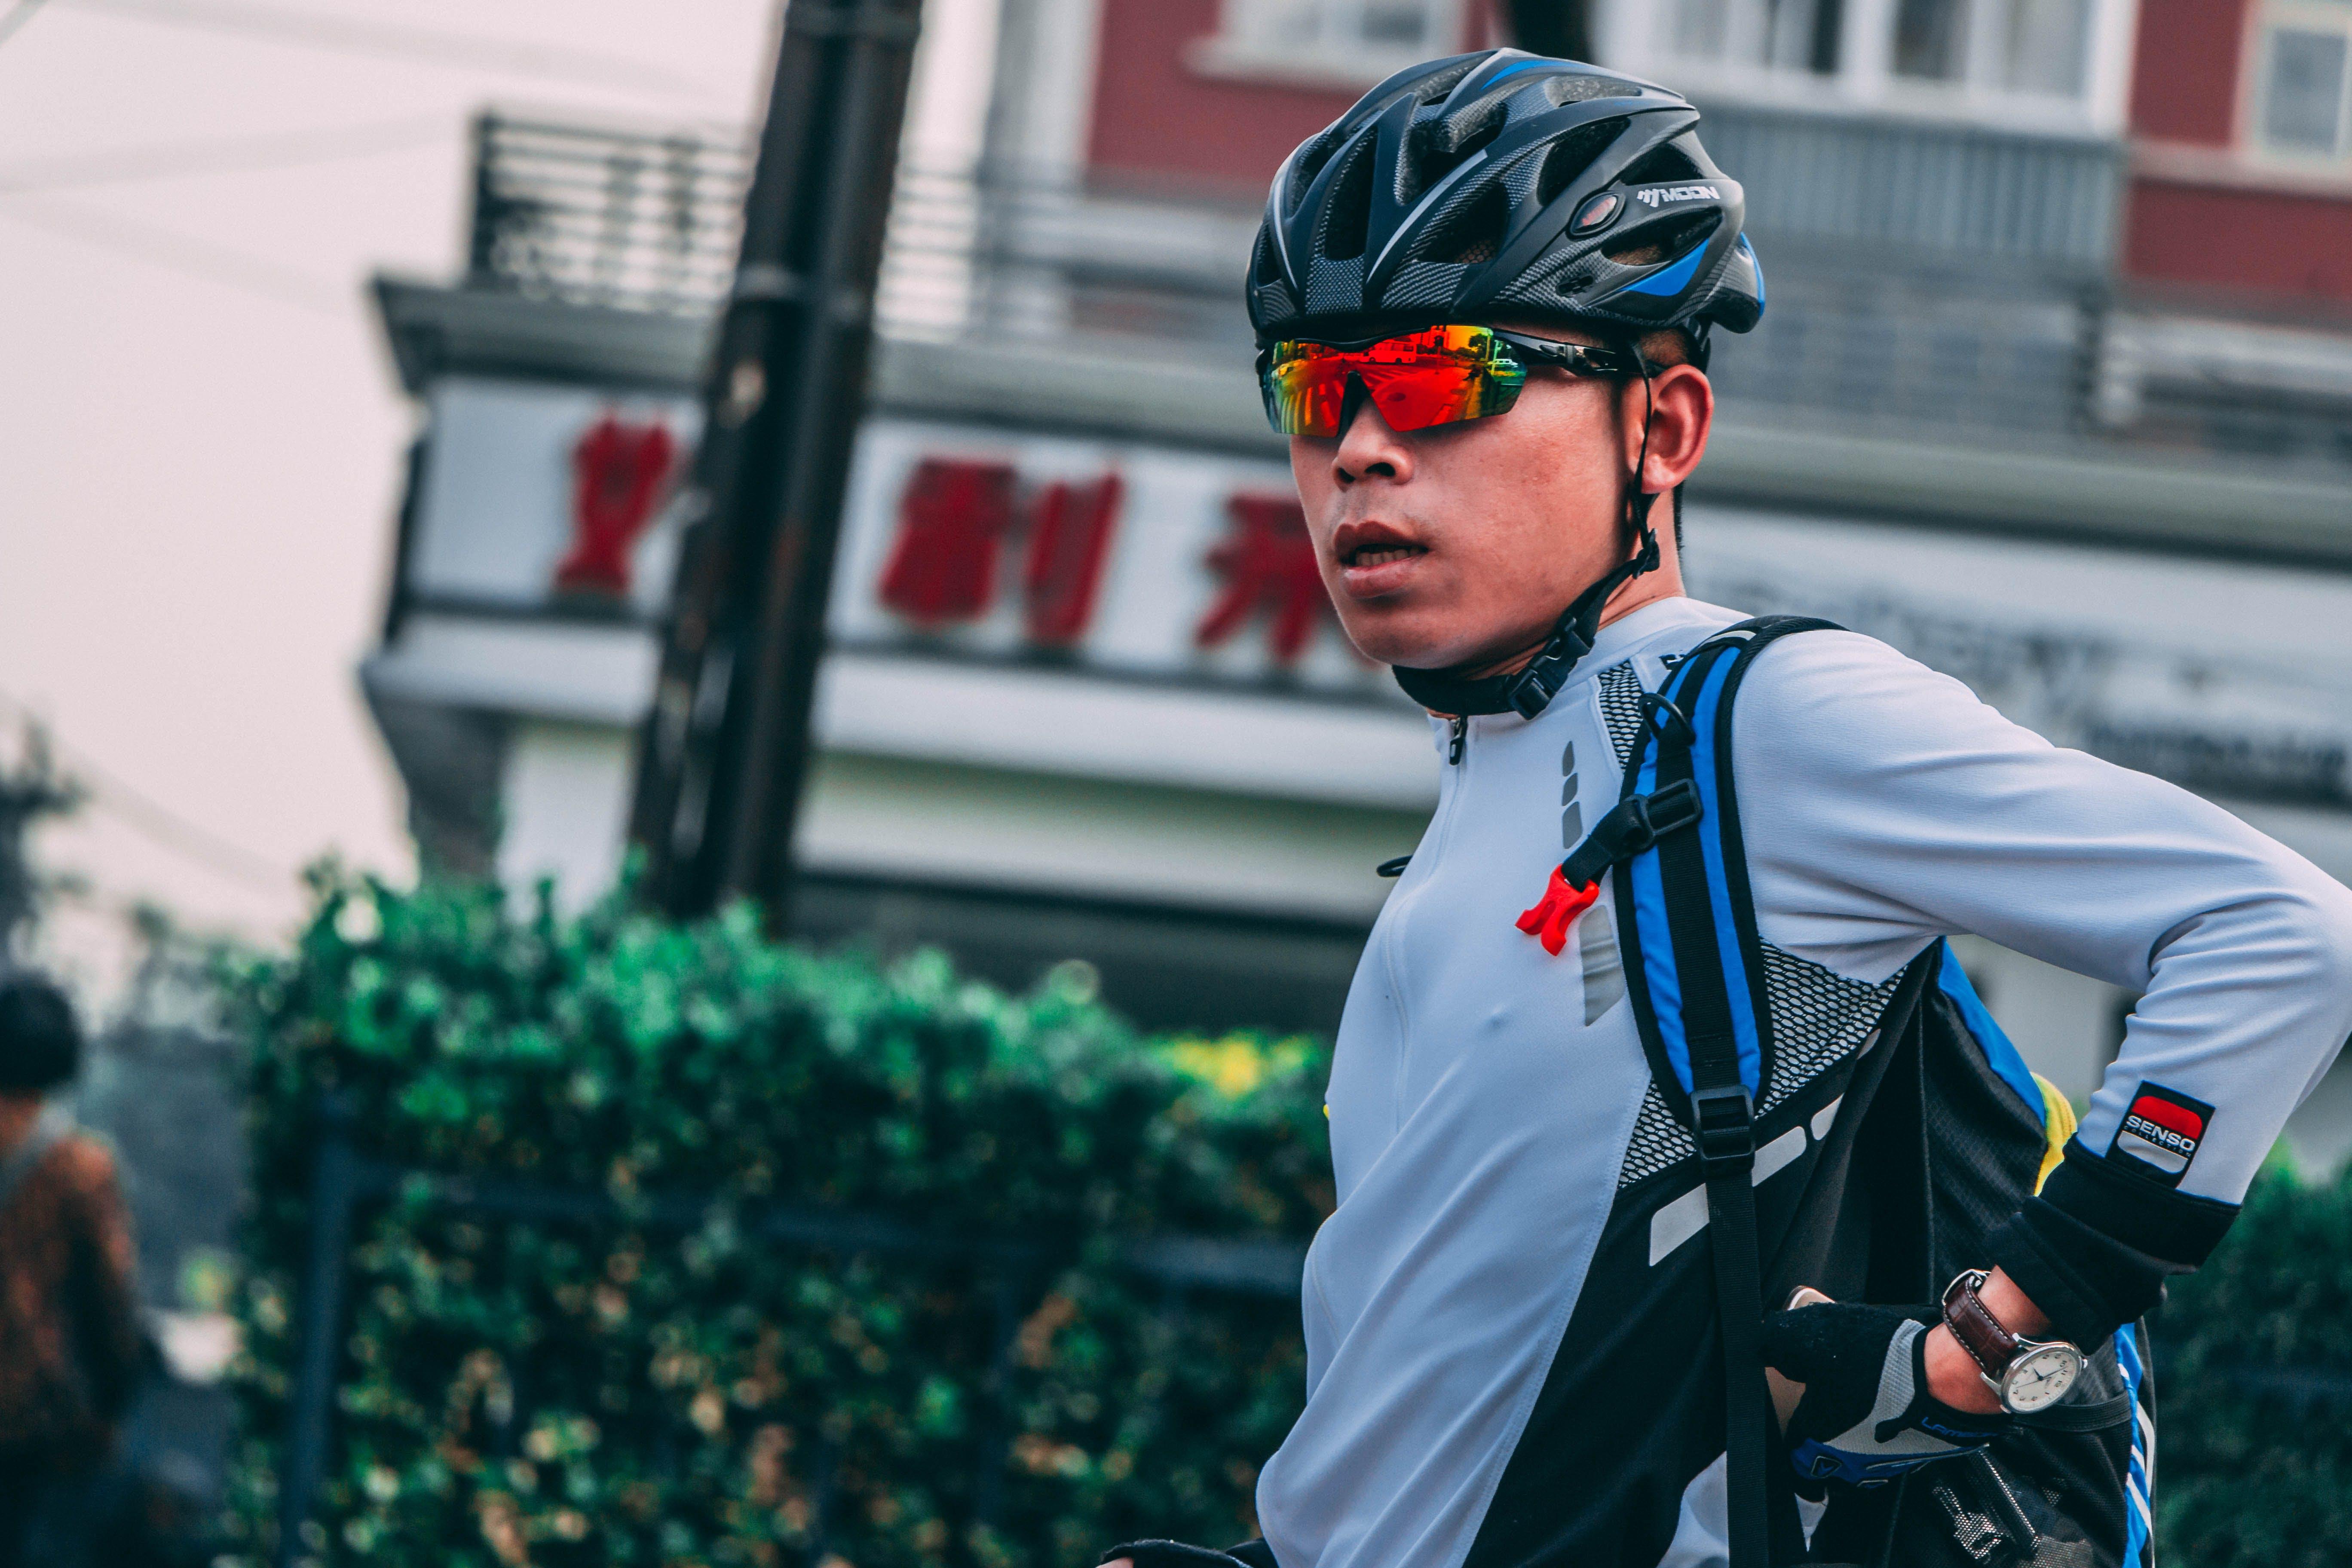 Man Wearing Sports Sunglasses and Black Bike Helmet